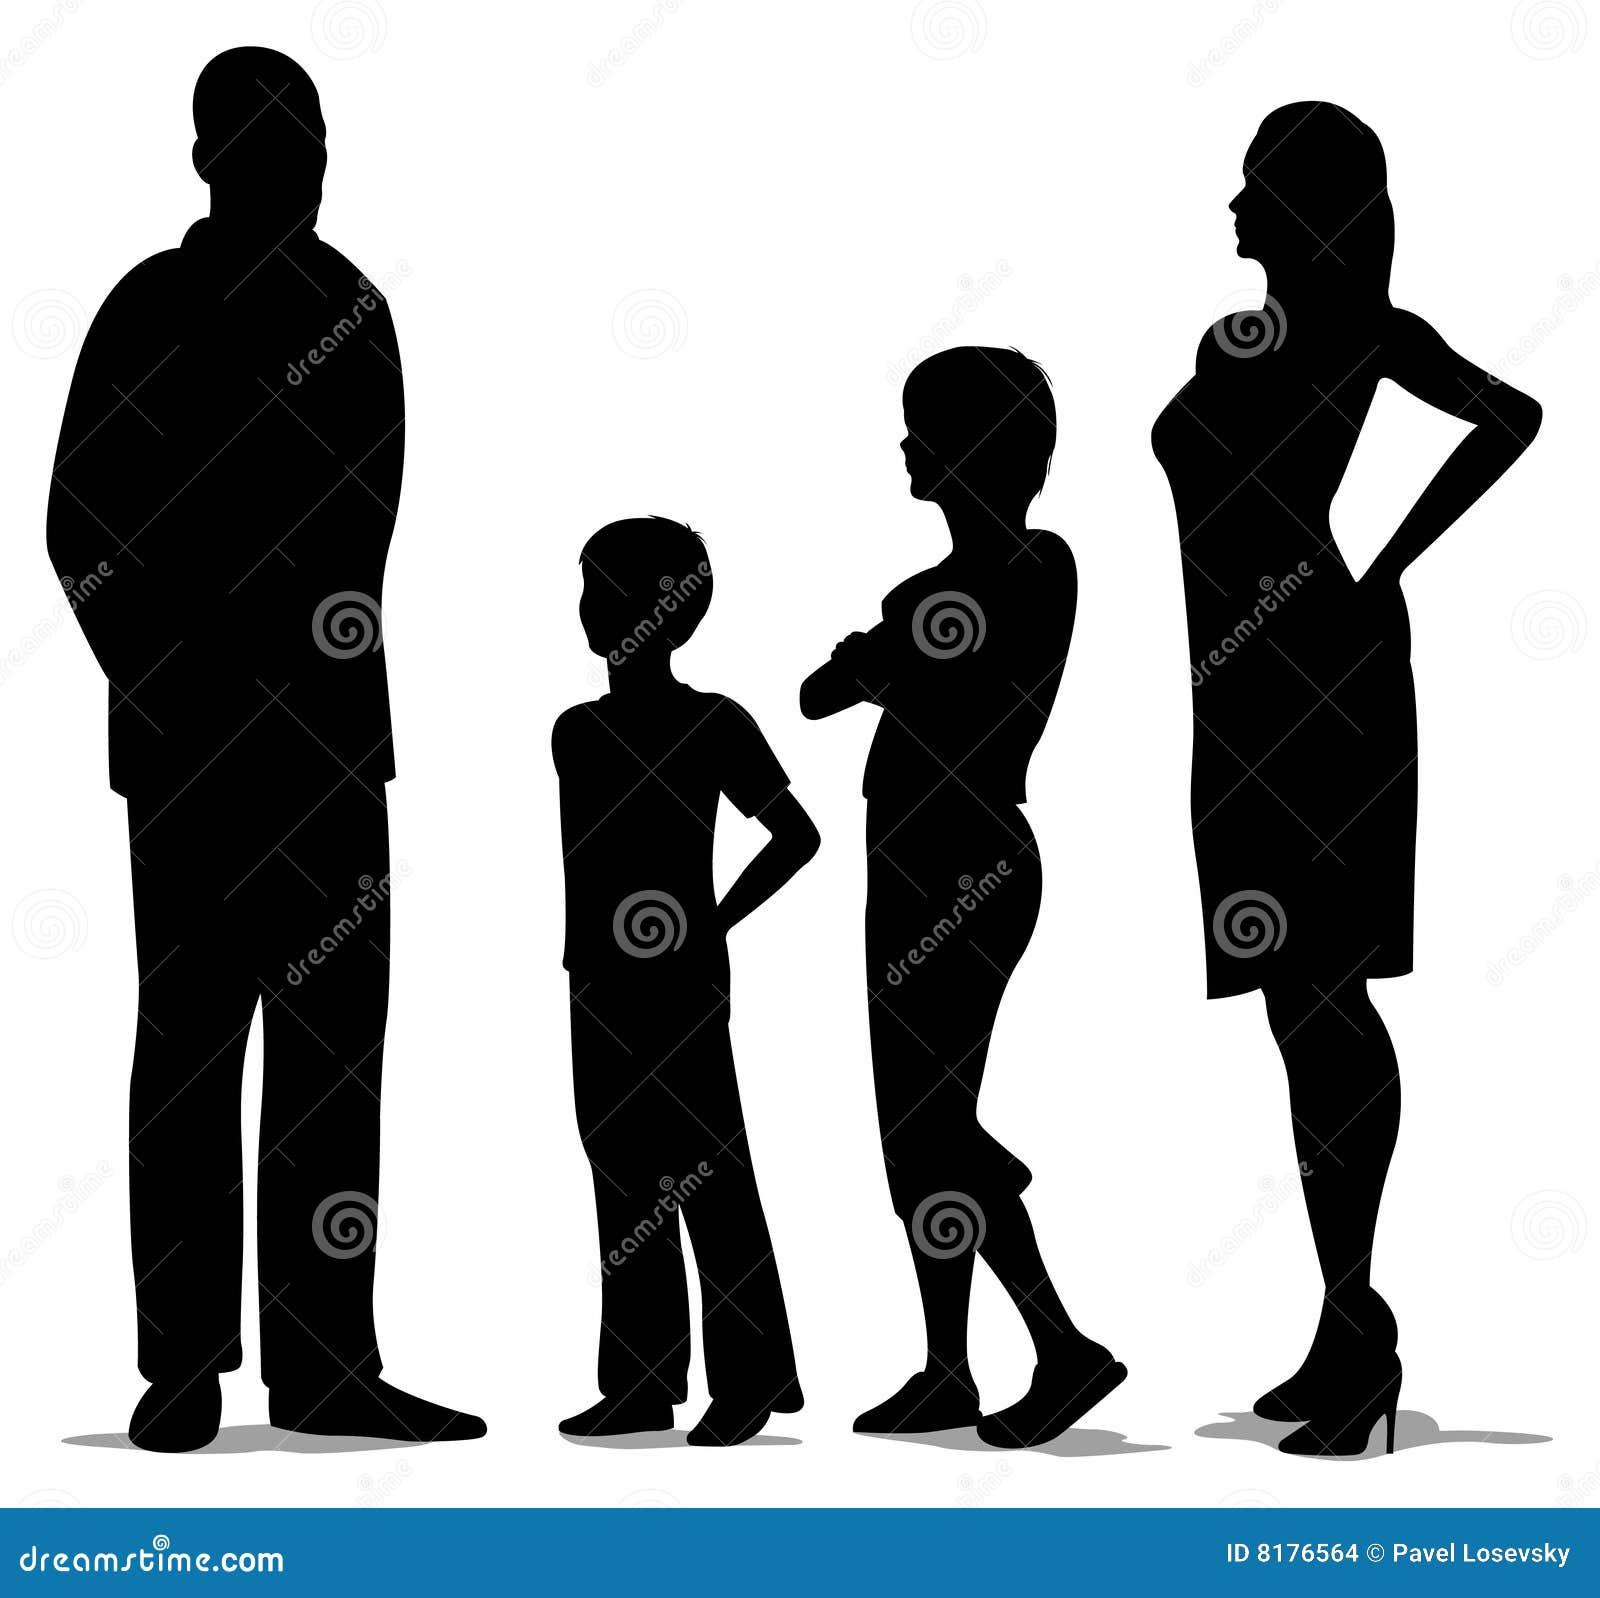 Familia de cuatro miembros derecha, silueta